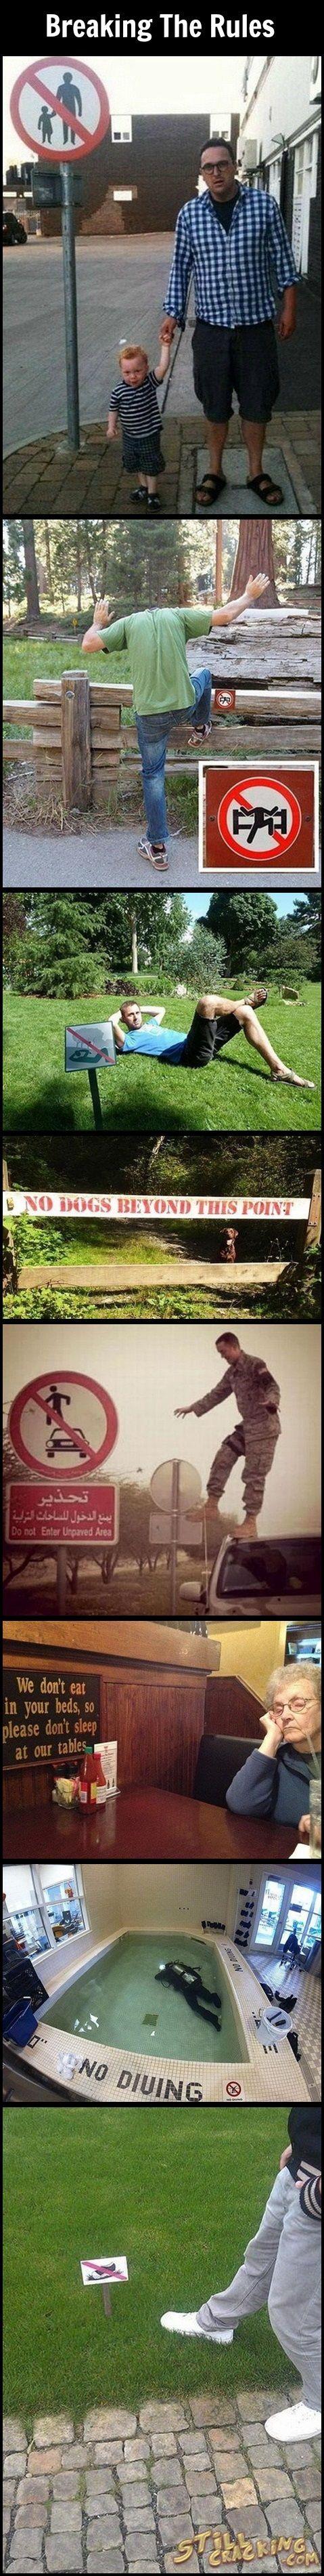 Breaking The Rules - Still Cracking #dauntlessrebels